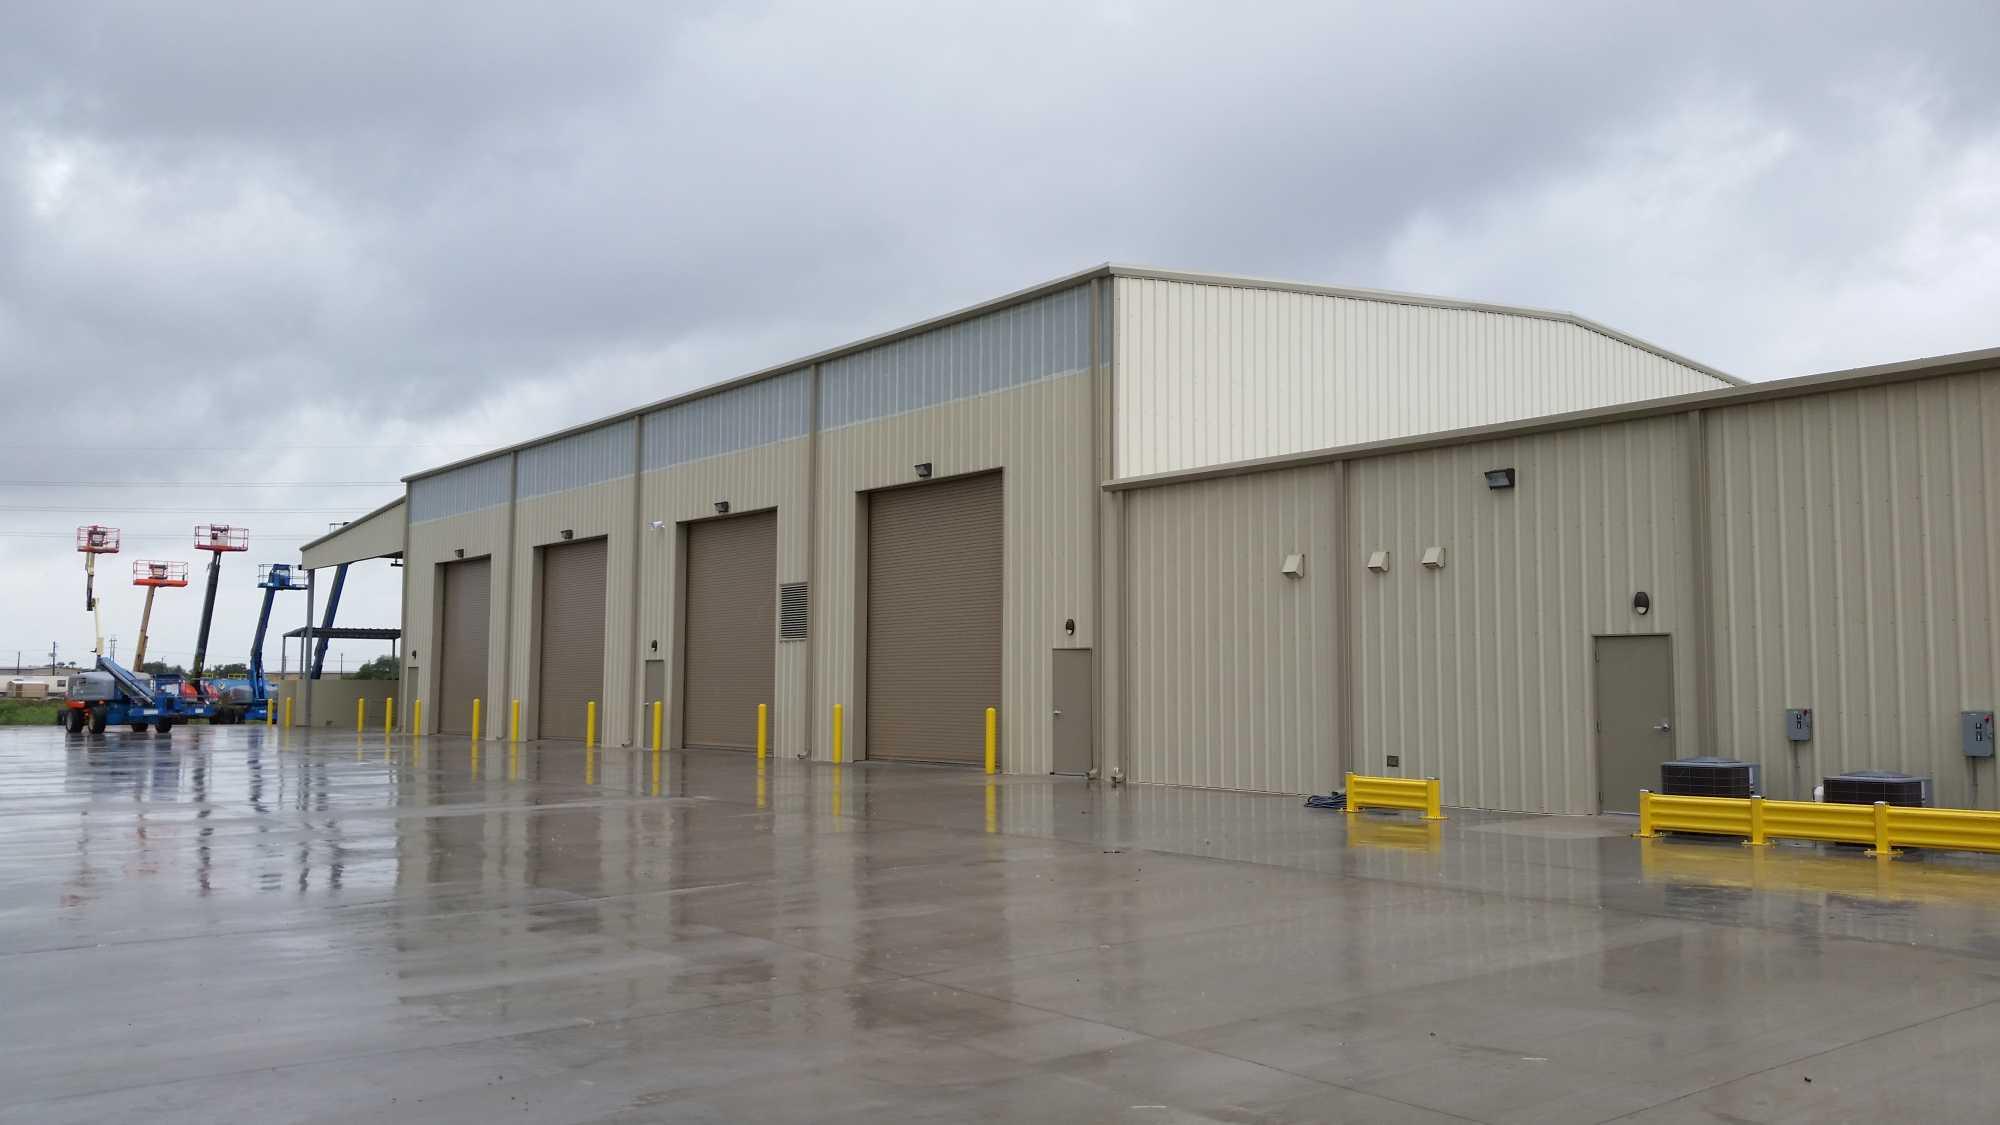 Beige 85x210 Industrial Steel Warehouse located in Corpus Christie, Texas